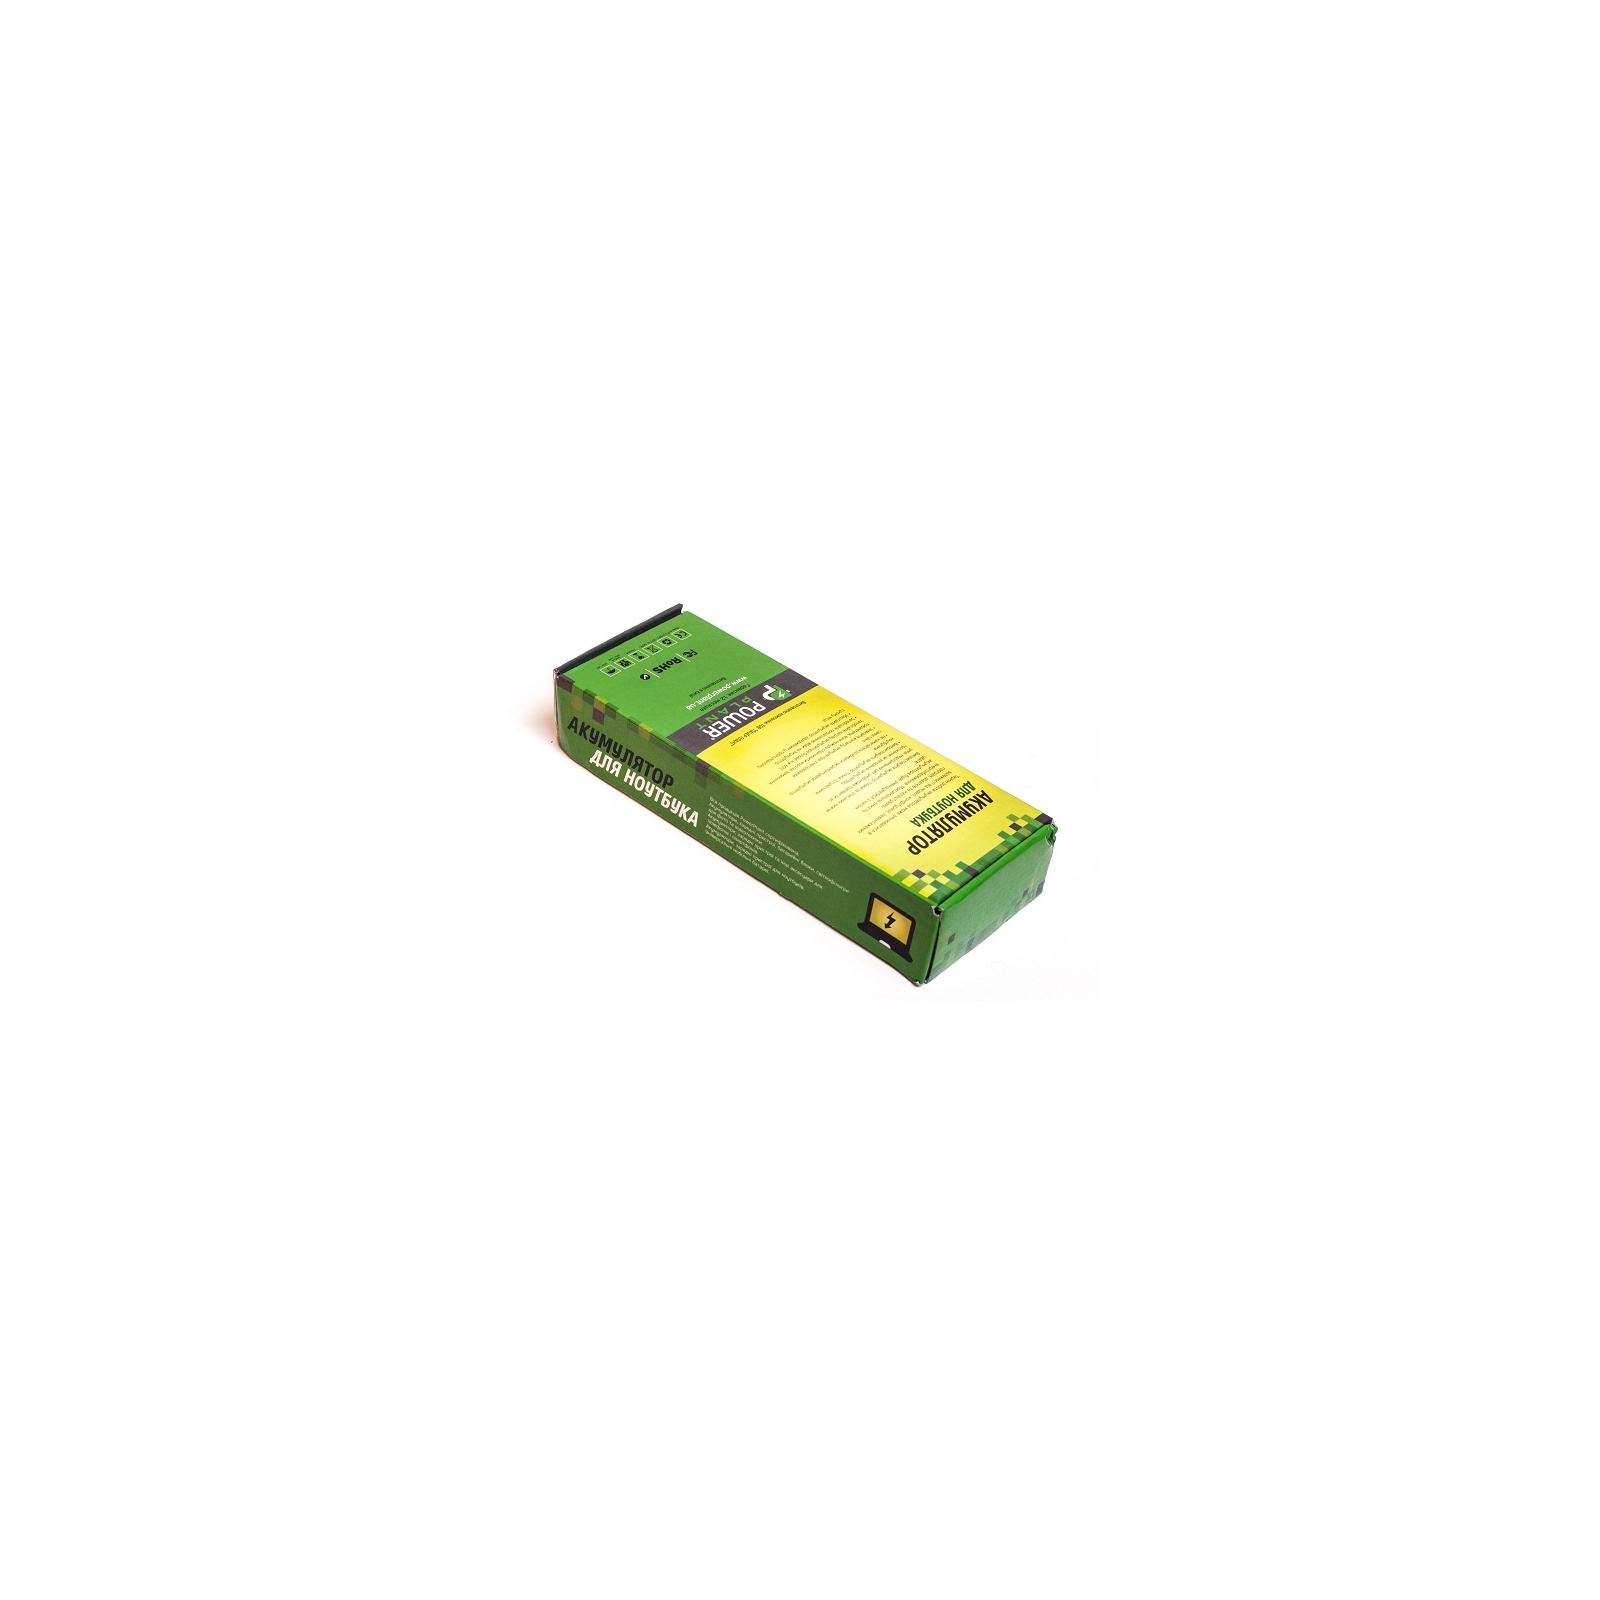 Аккумулятор для ноутбука LENOVO IdeaPad G460 (L09L6Y02 ,LOG460LH) 10.8V 4400mAh PowerPlant (NB00000291) изображение 2